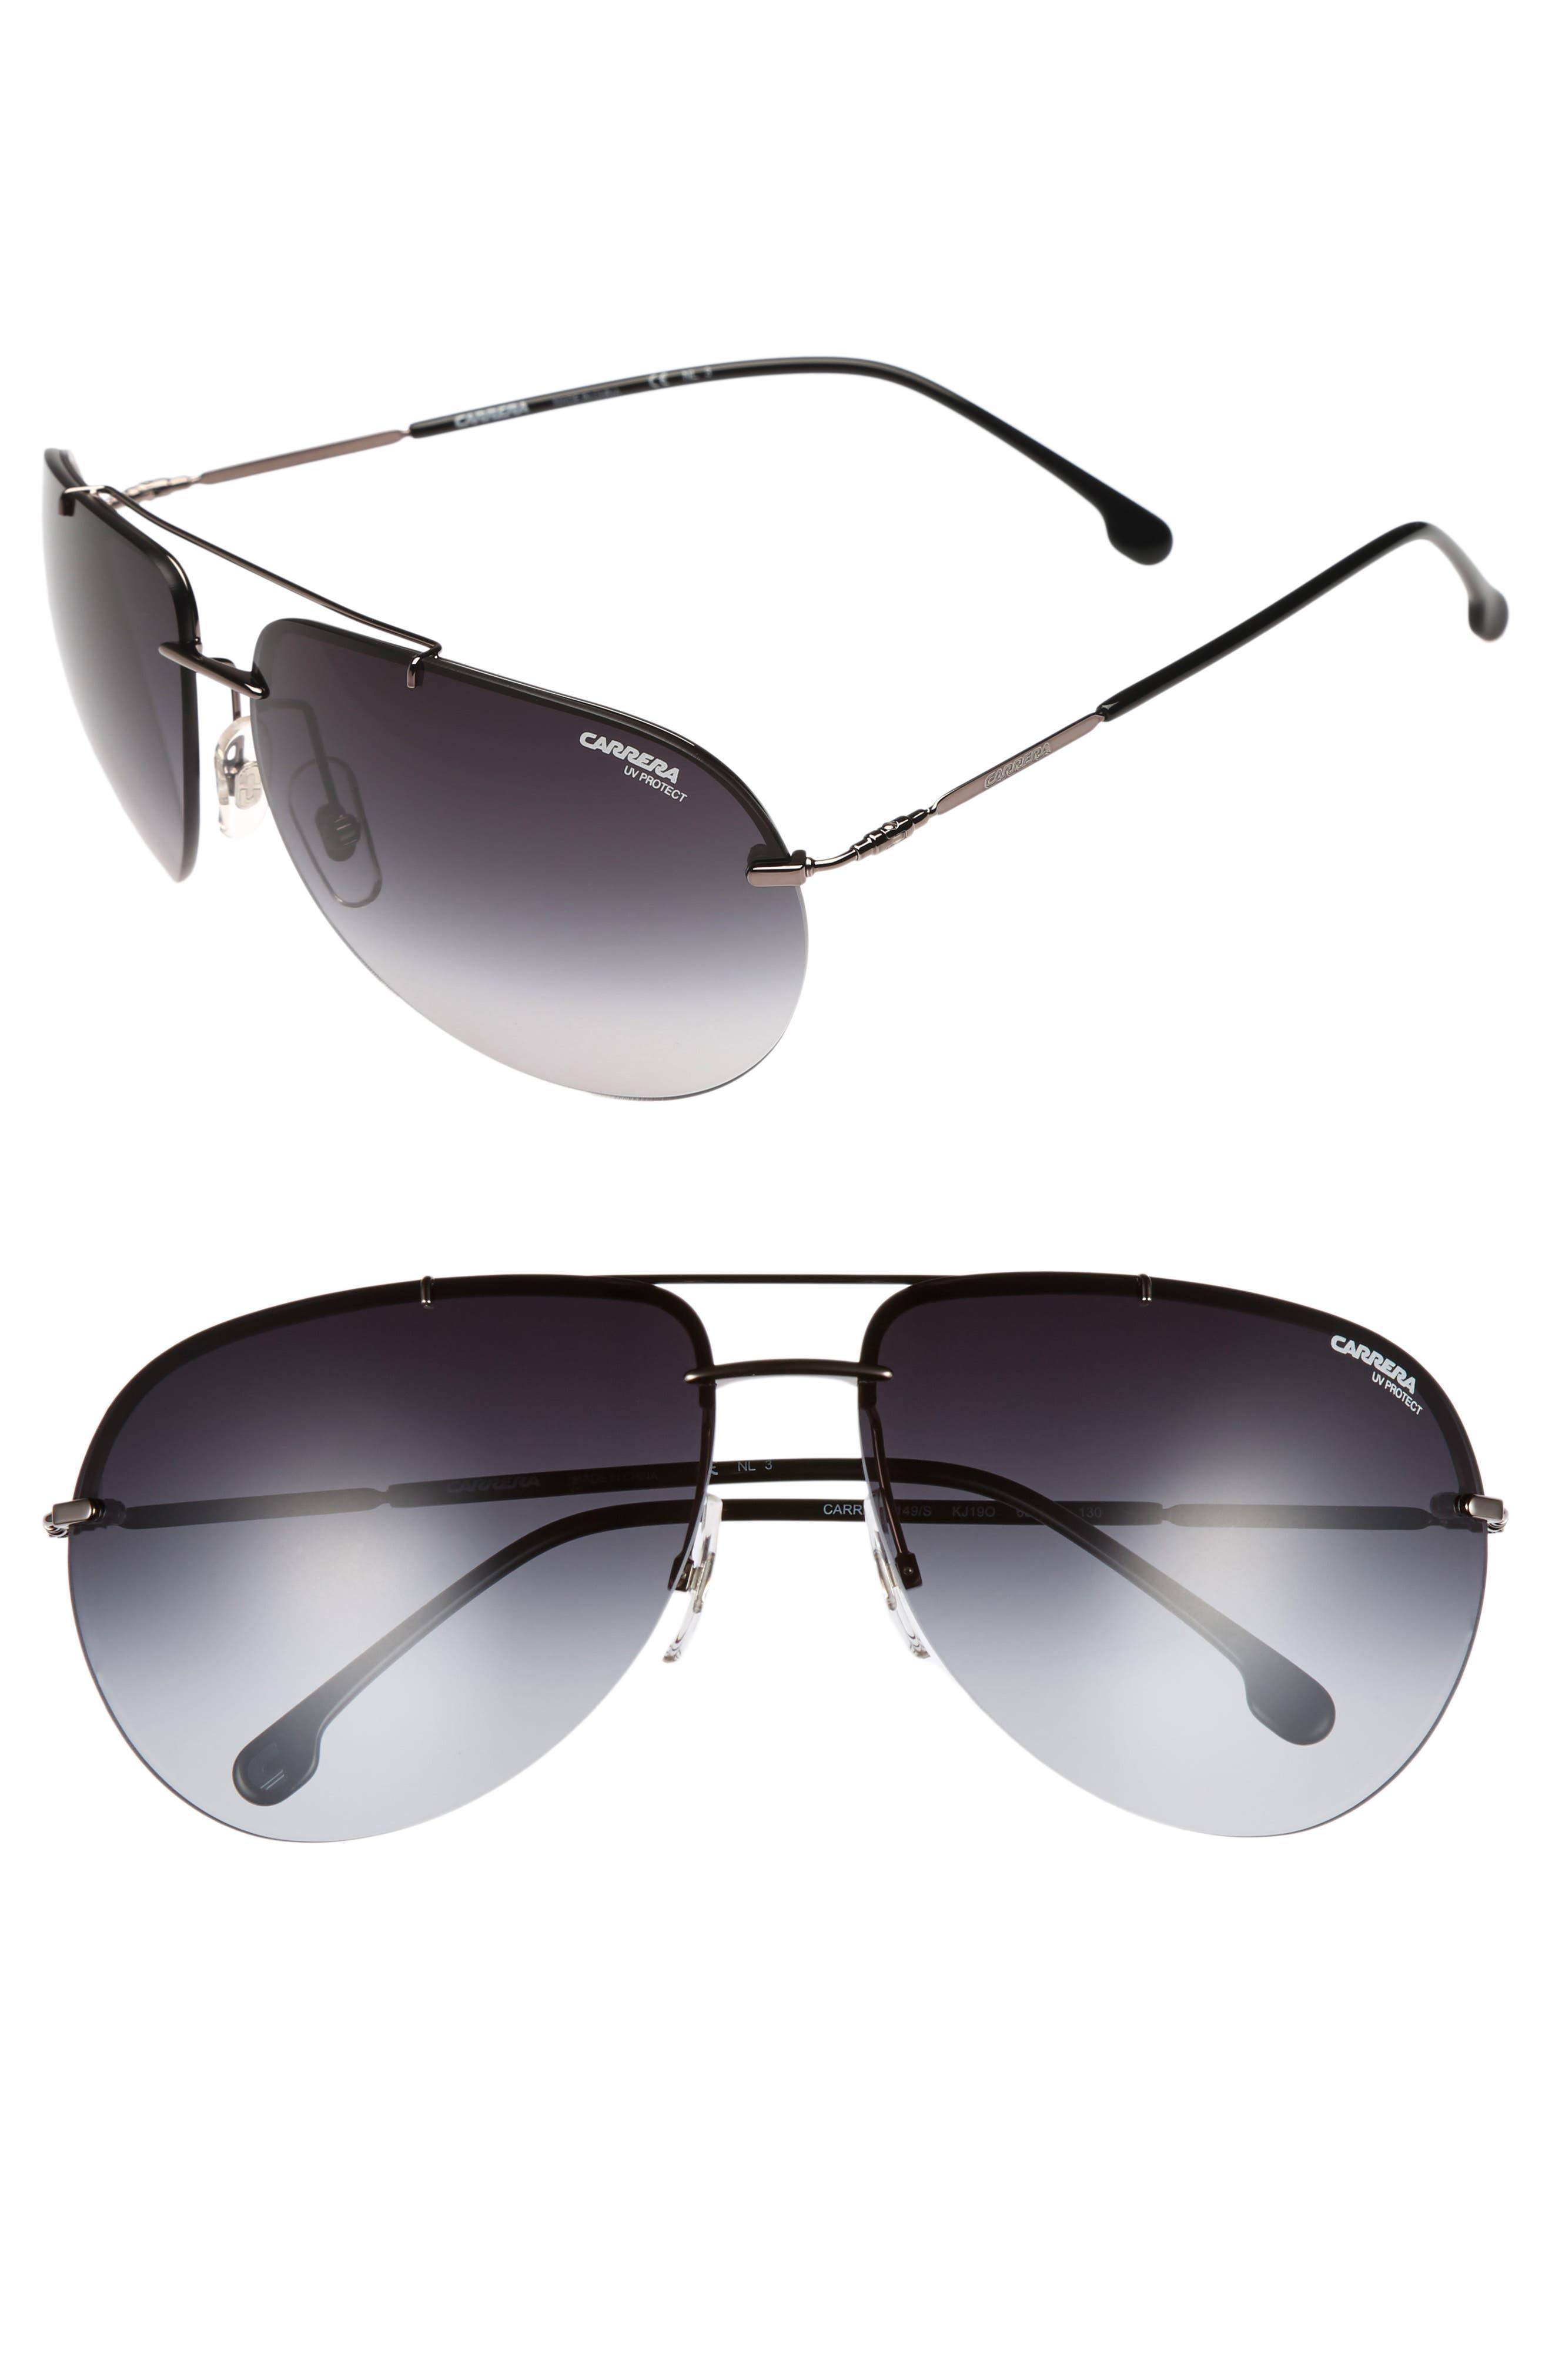 Main Image - Carrera Eyewear 149S 65mm Polarized Aviator Sunglasses